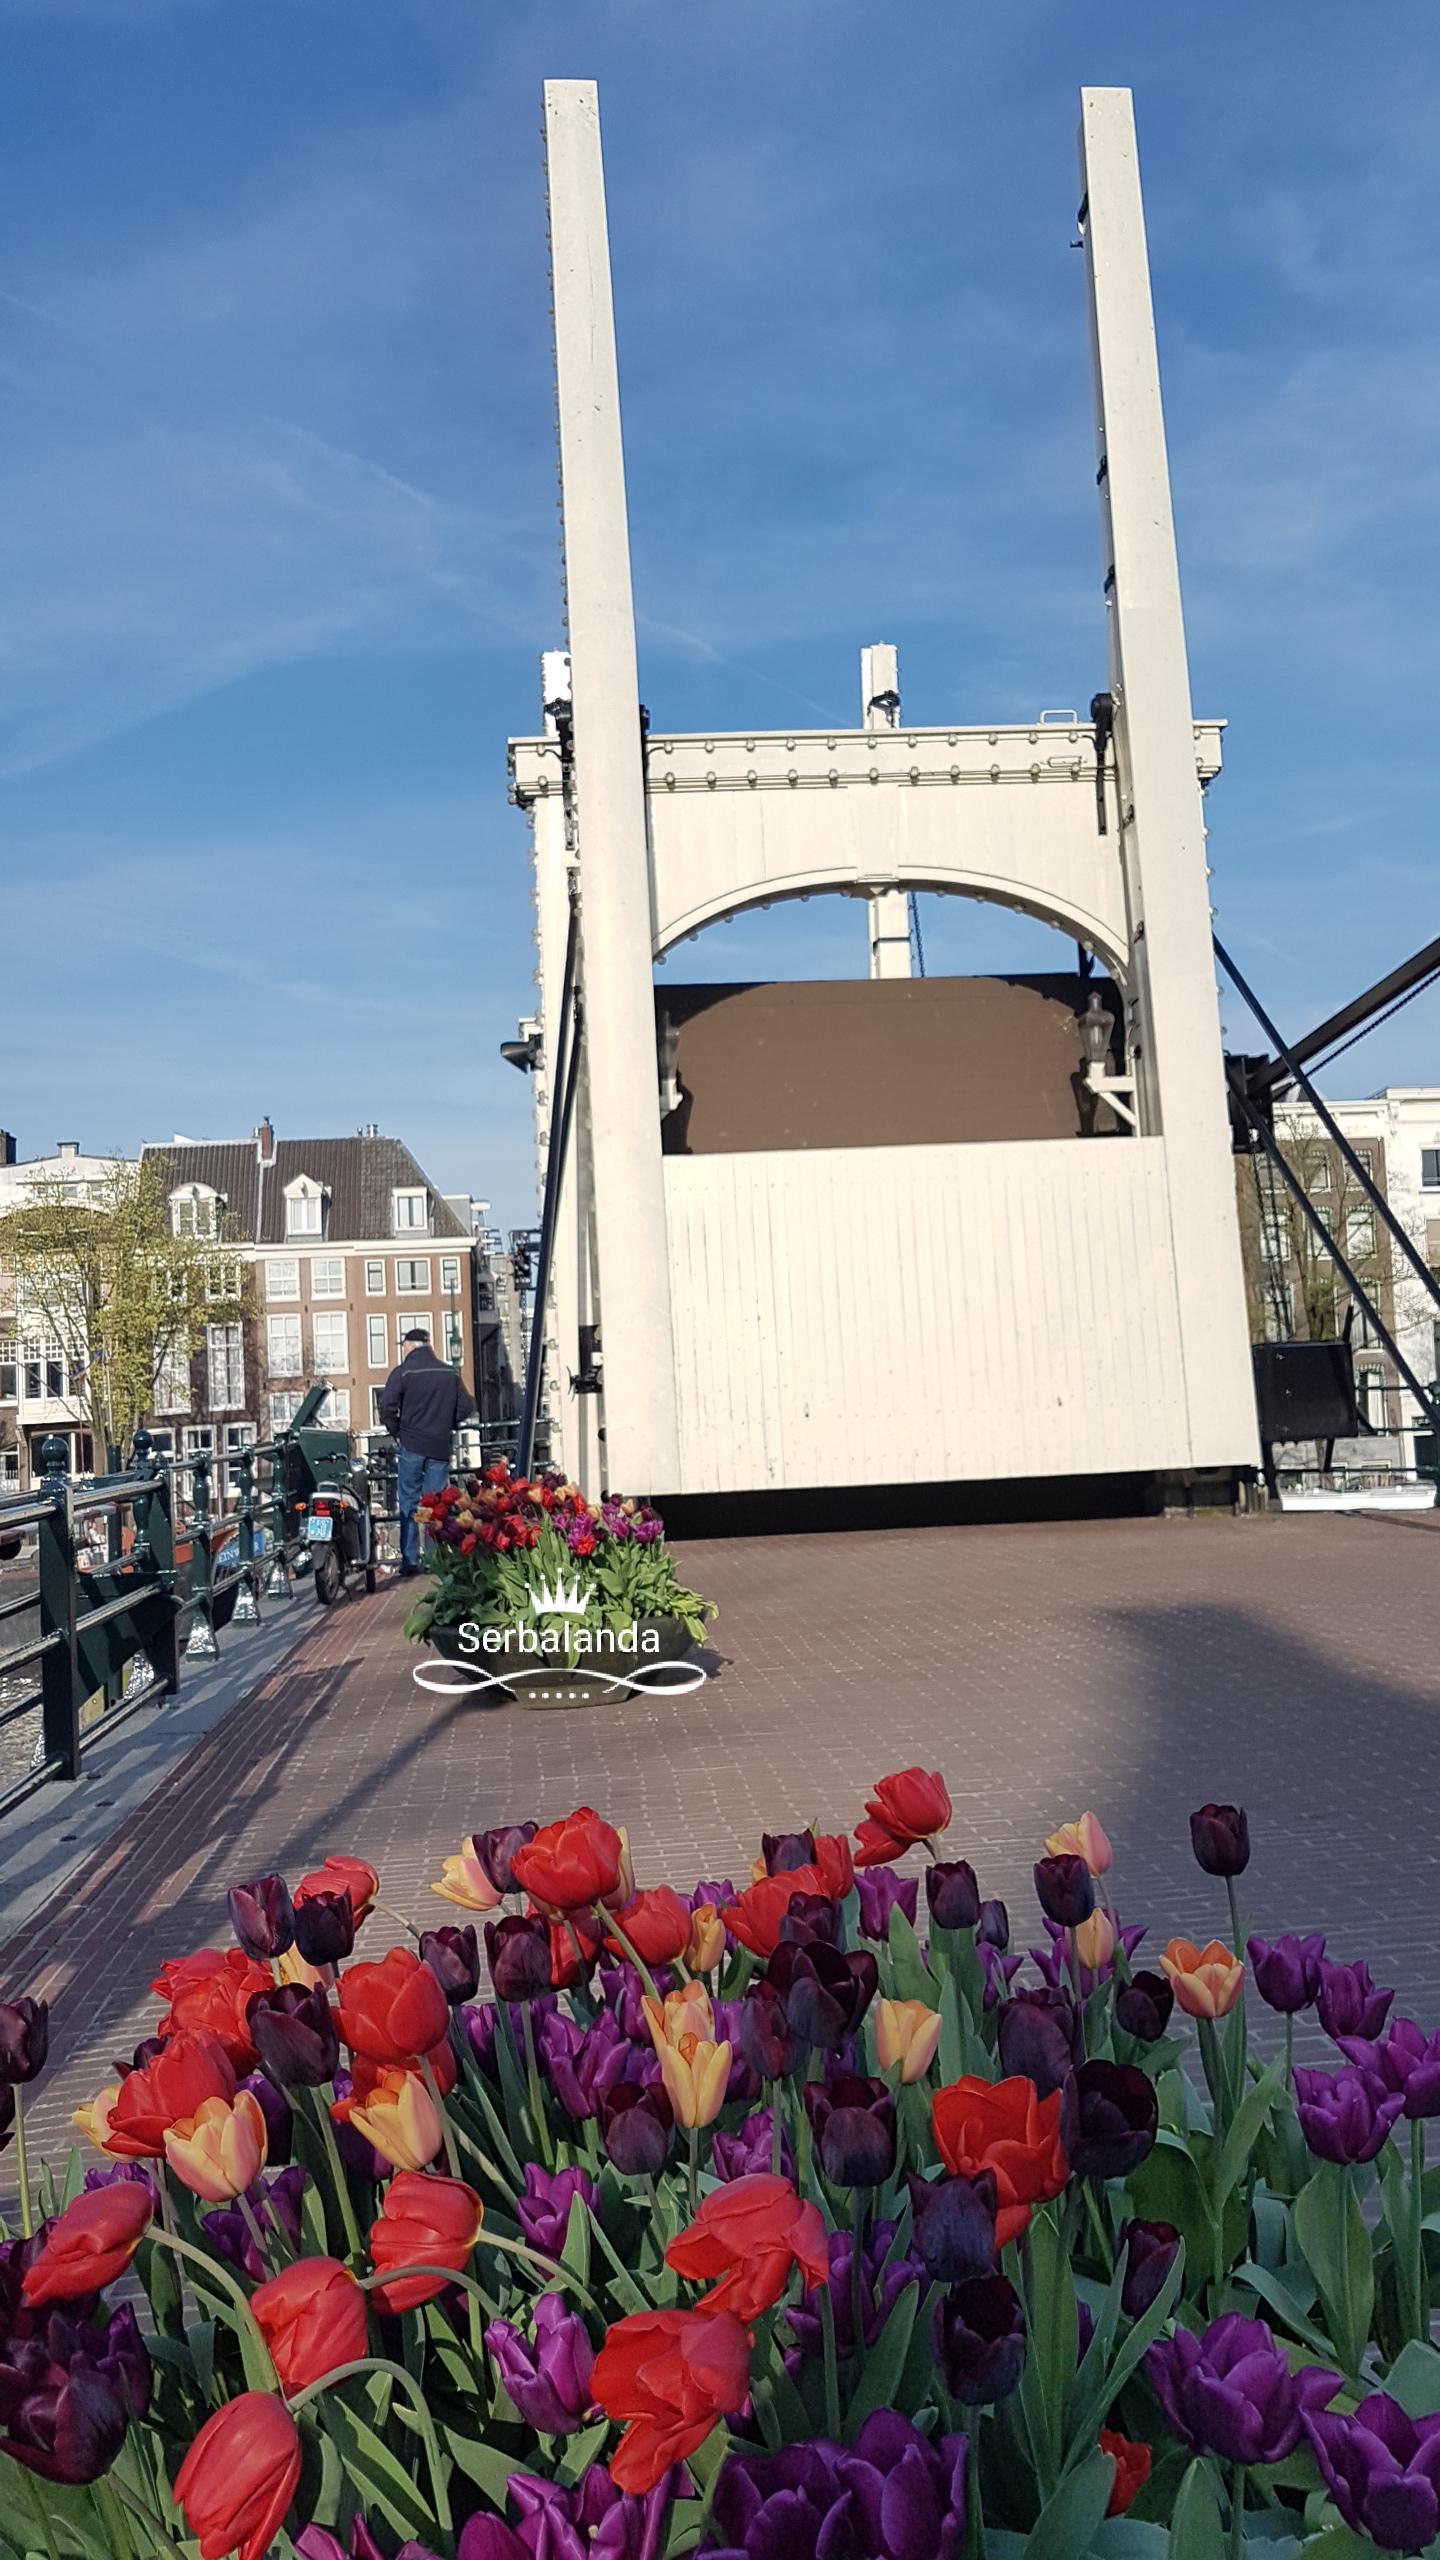 Bunga Tulip, Jembatan Kayu, Spot Amsterdam, Skinny Bridge